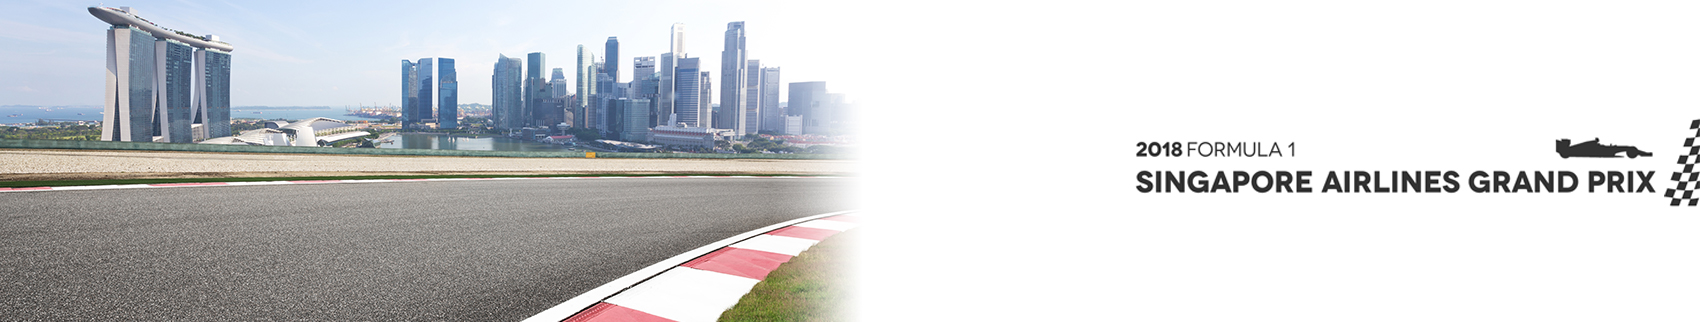 Formule 1 Singapore